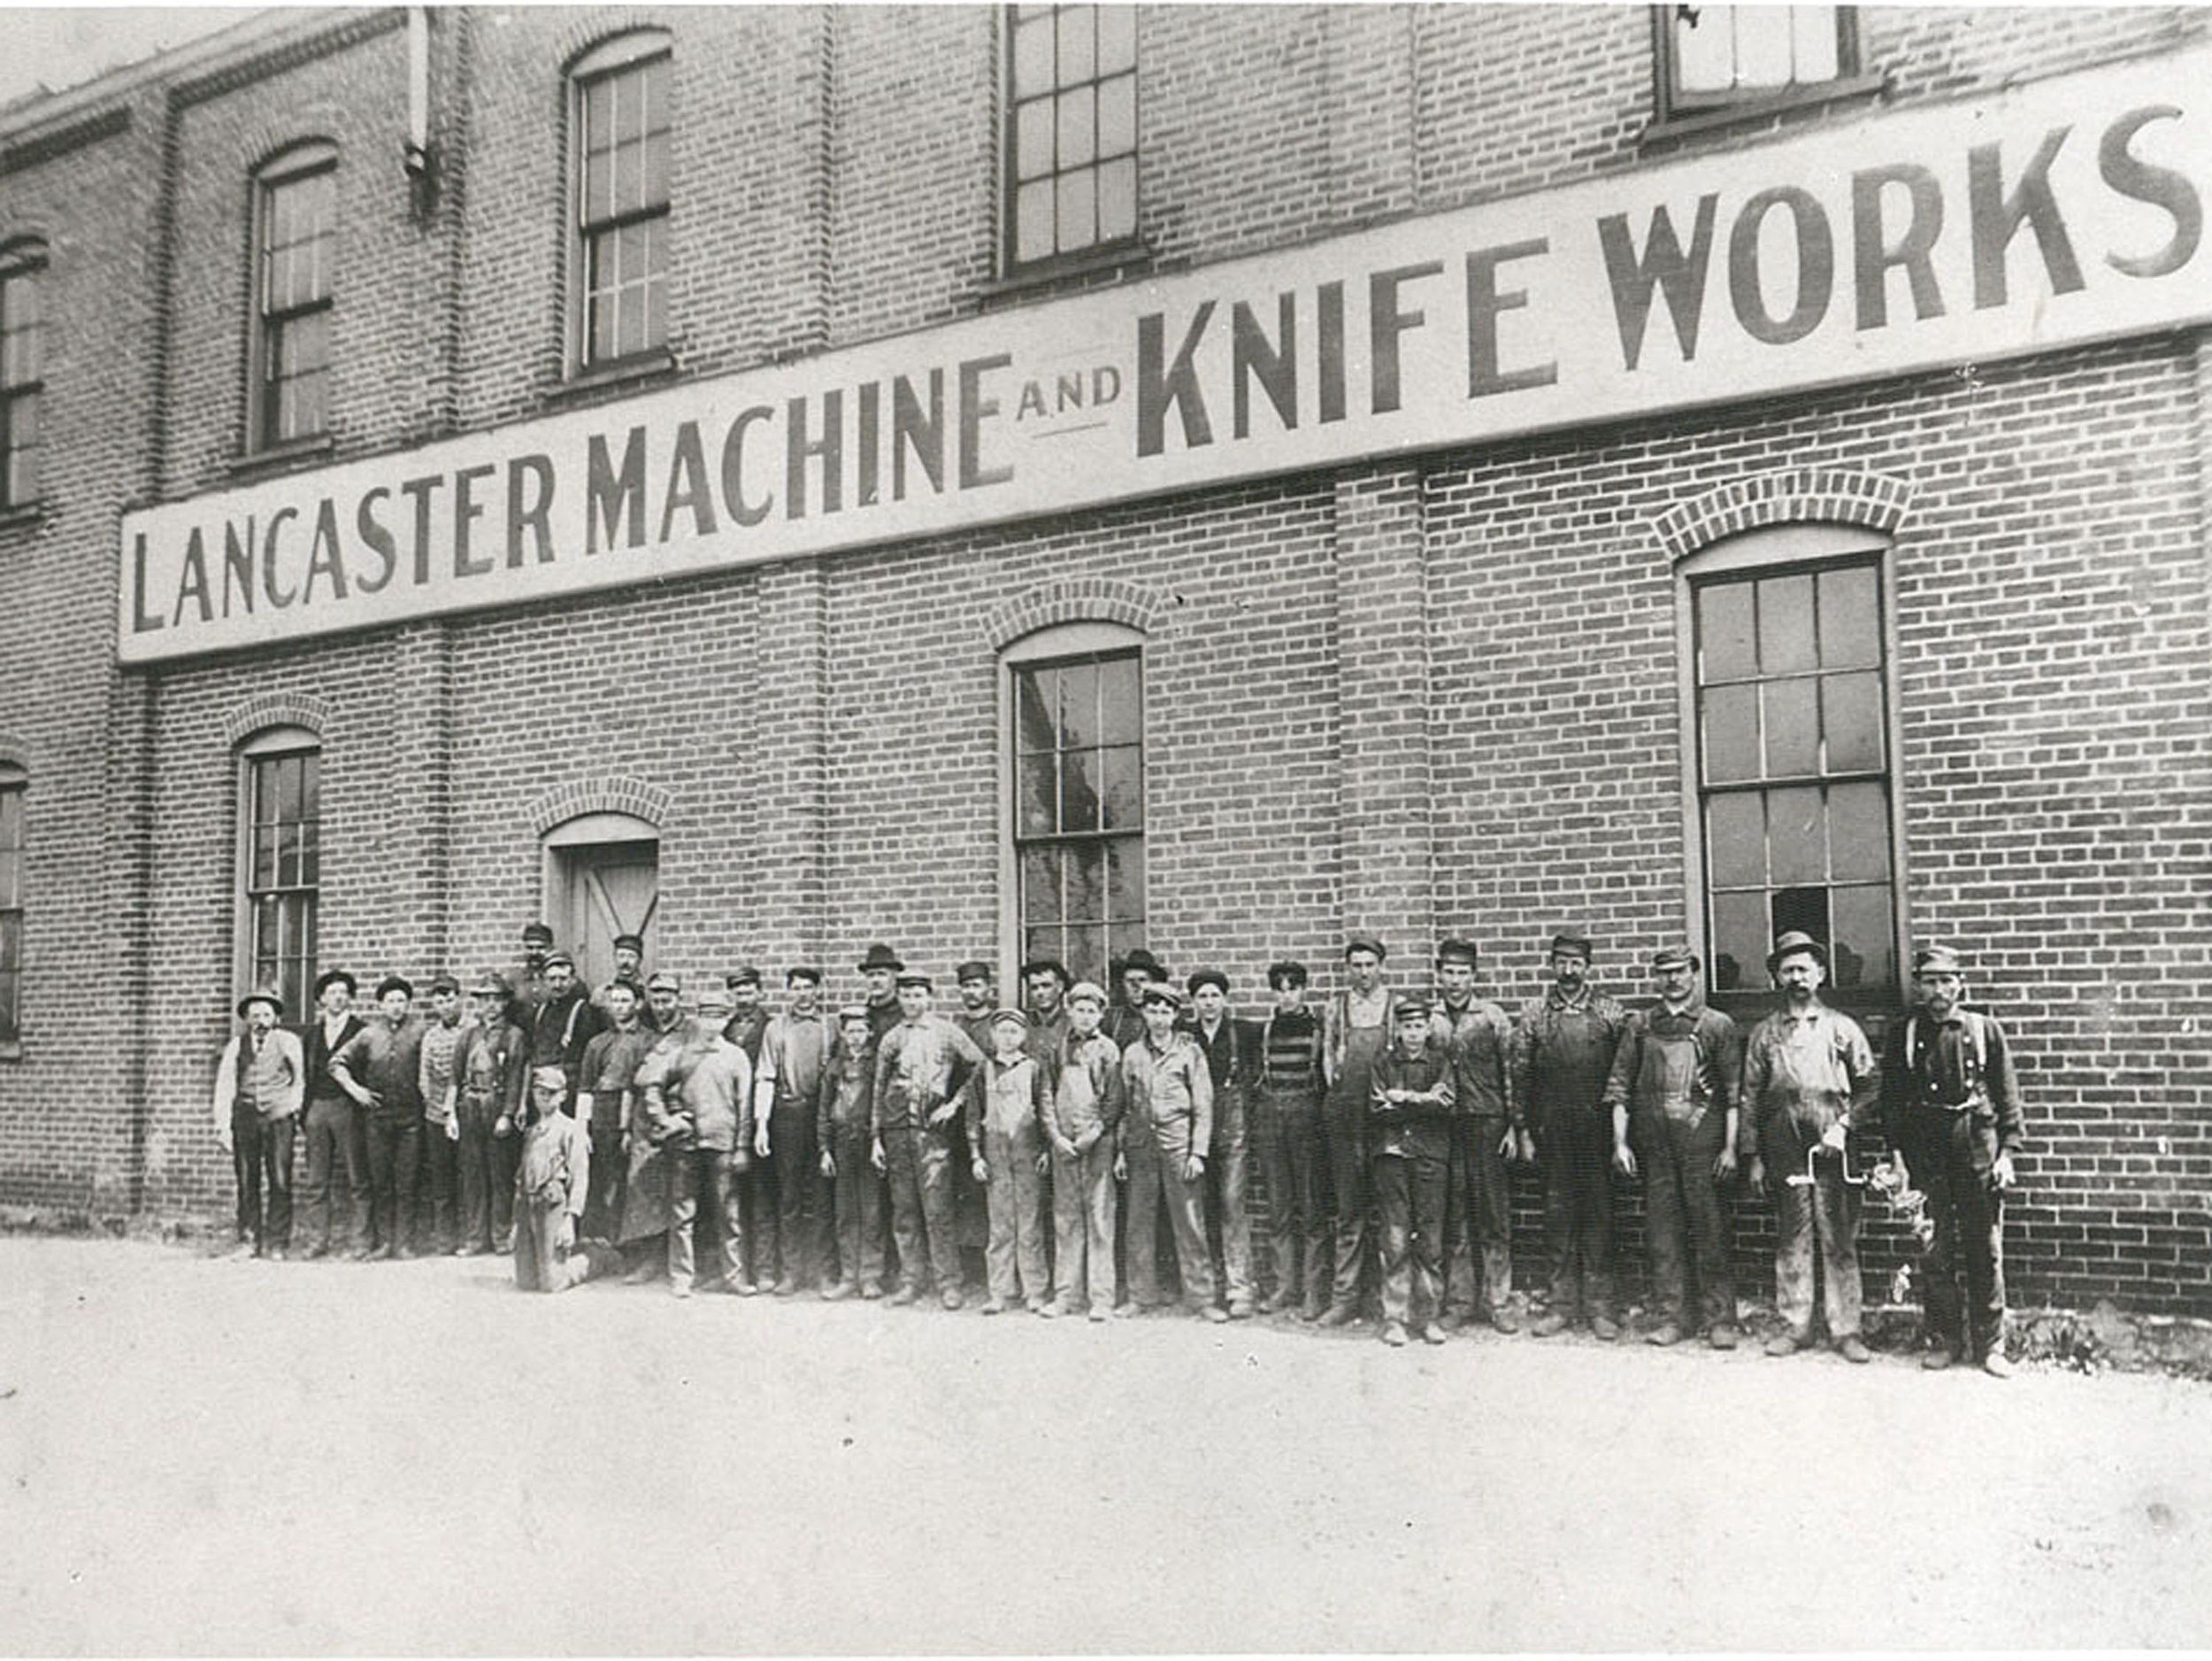 indust Lancaster Knife Works.jpg